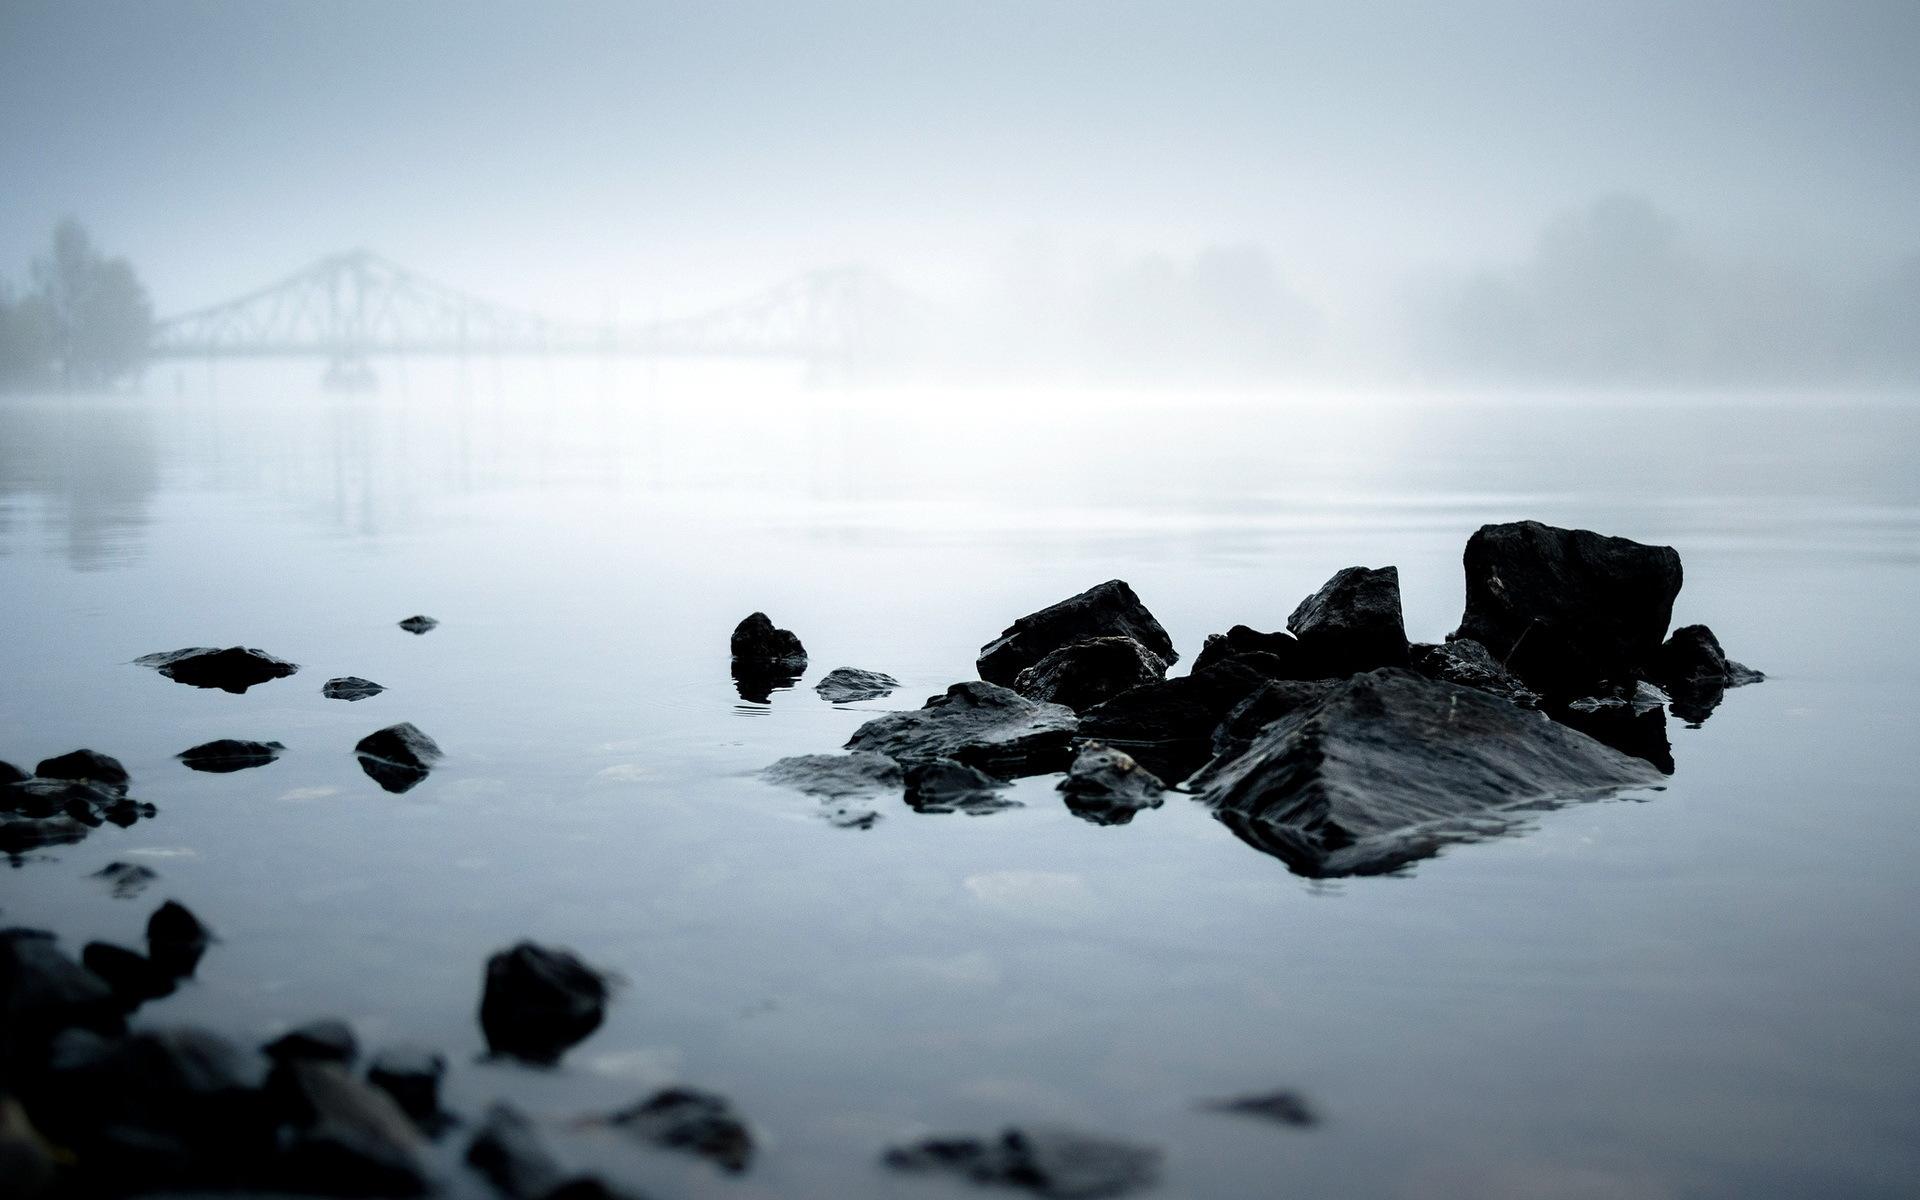 Morning river fog landscape shore reflection mist bridge wallpaper